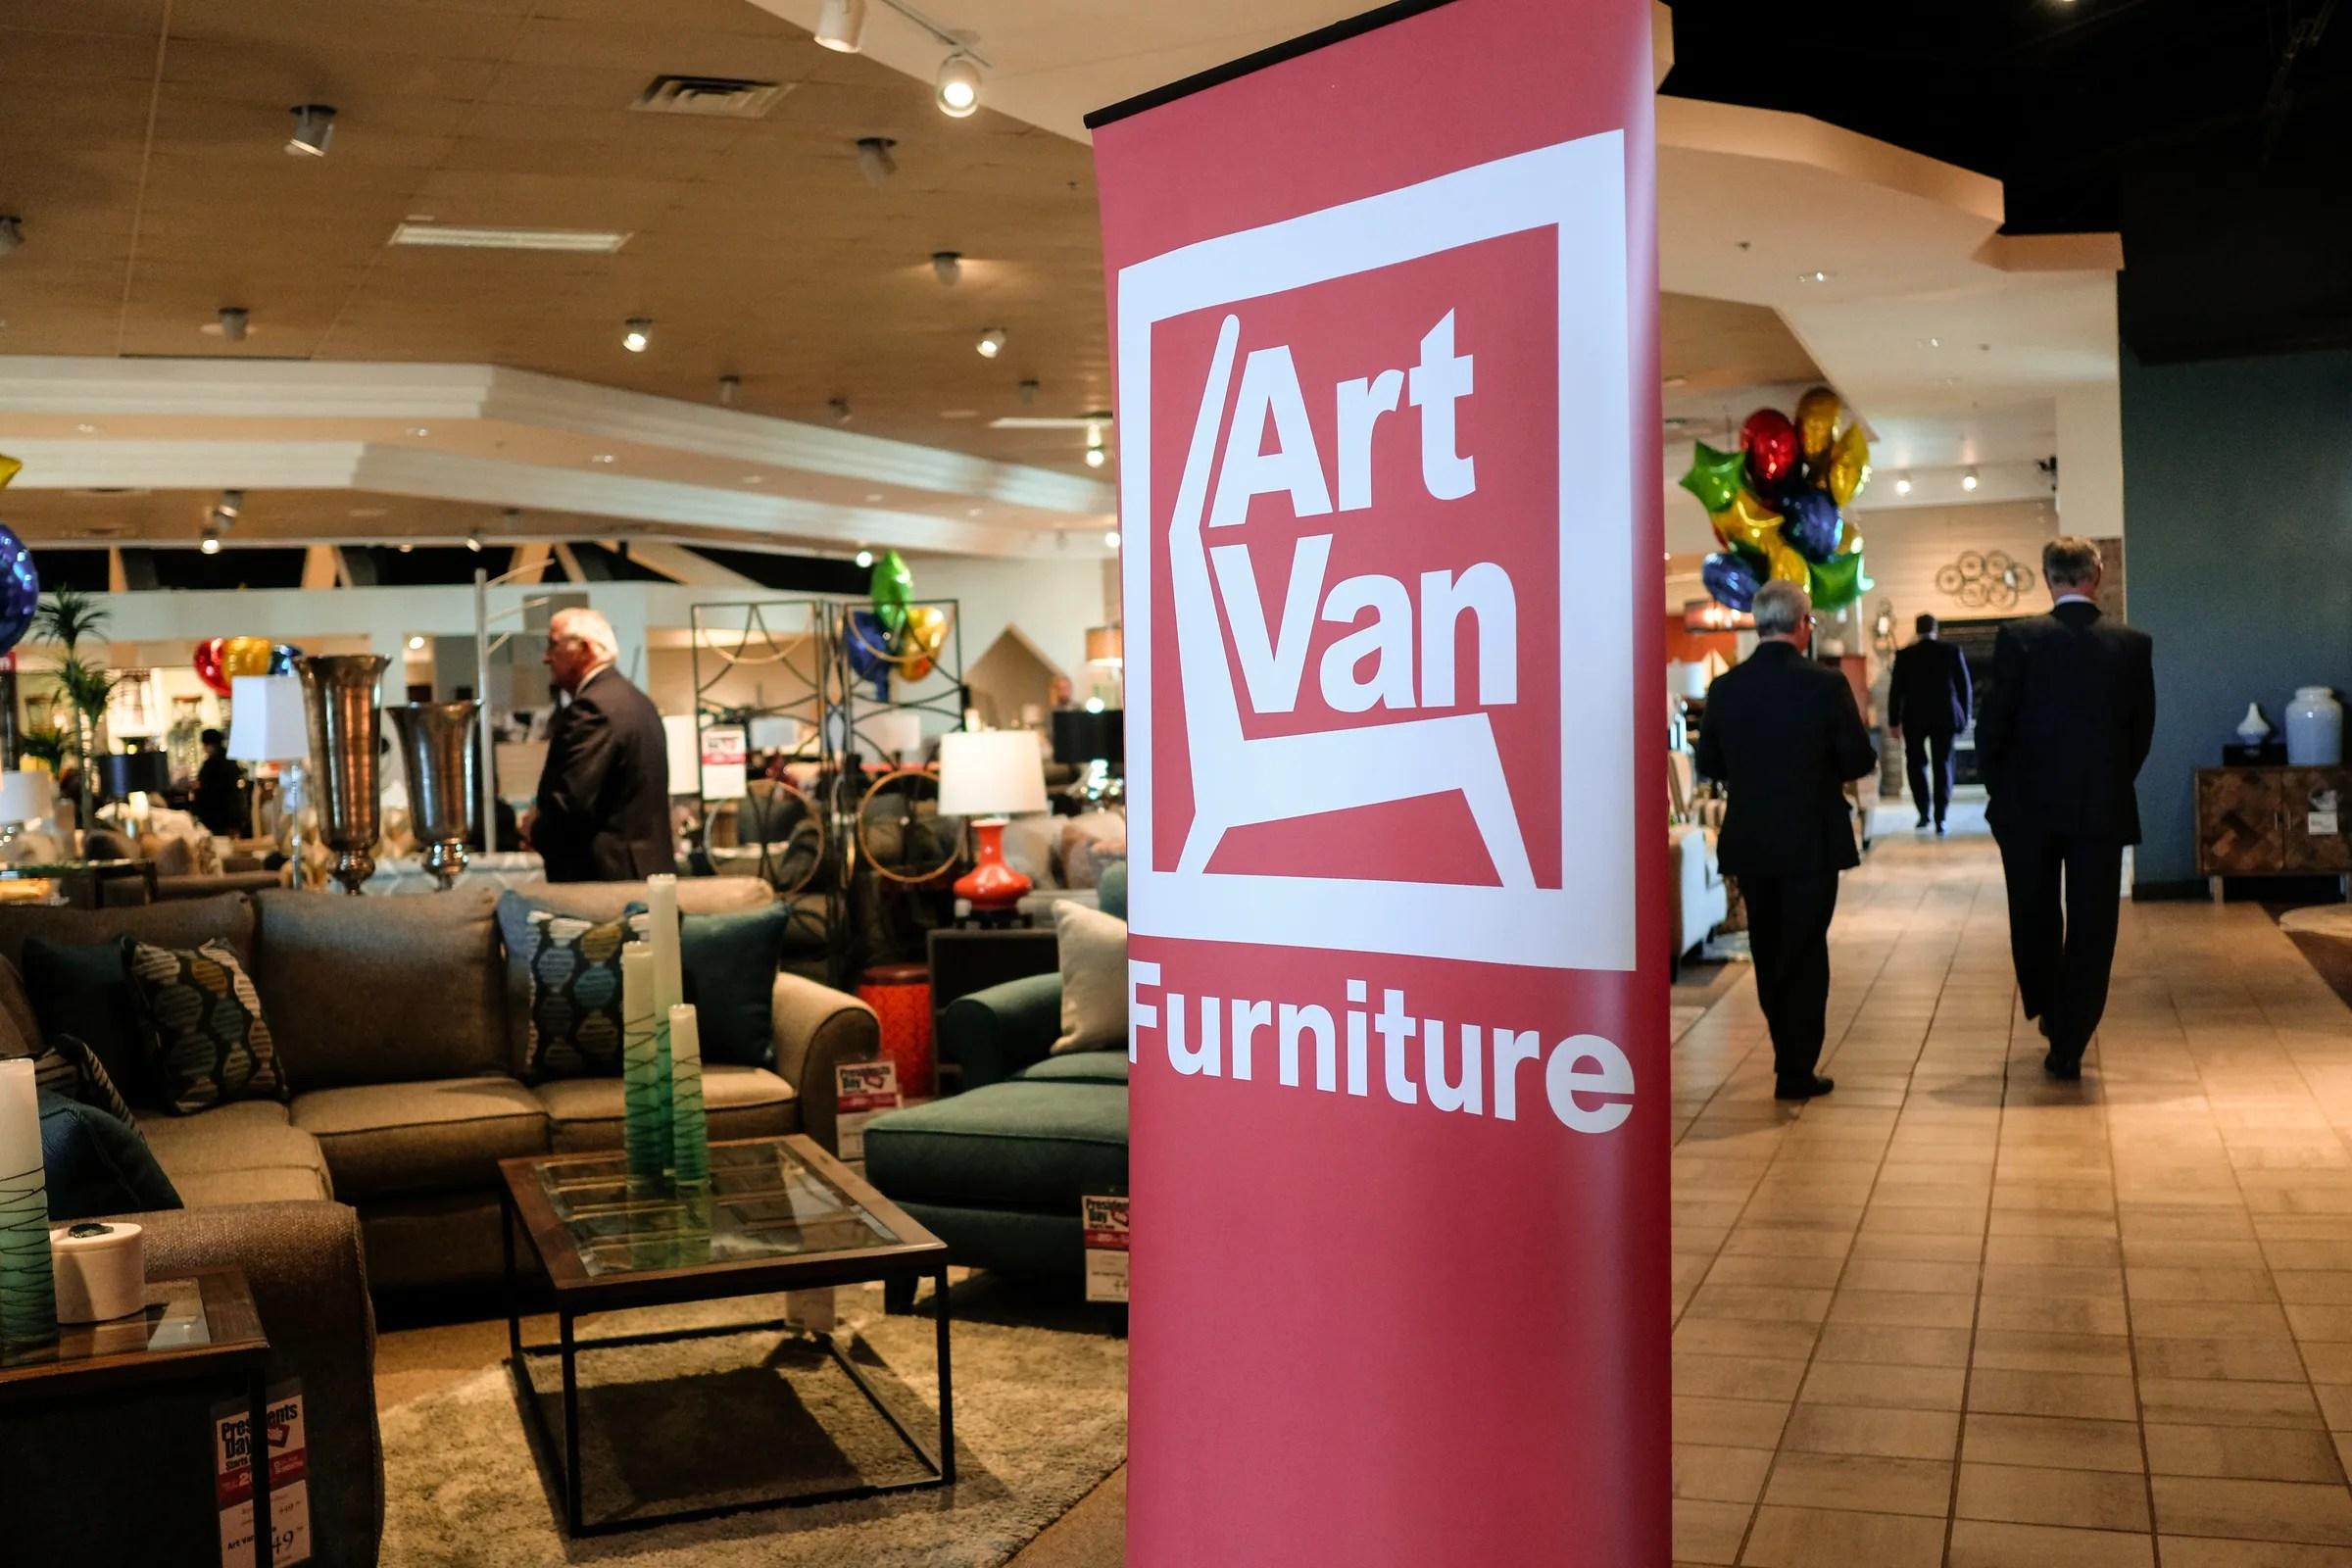 art van furniture files for chapter 11